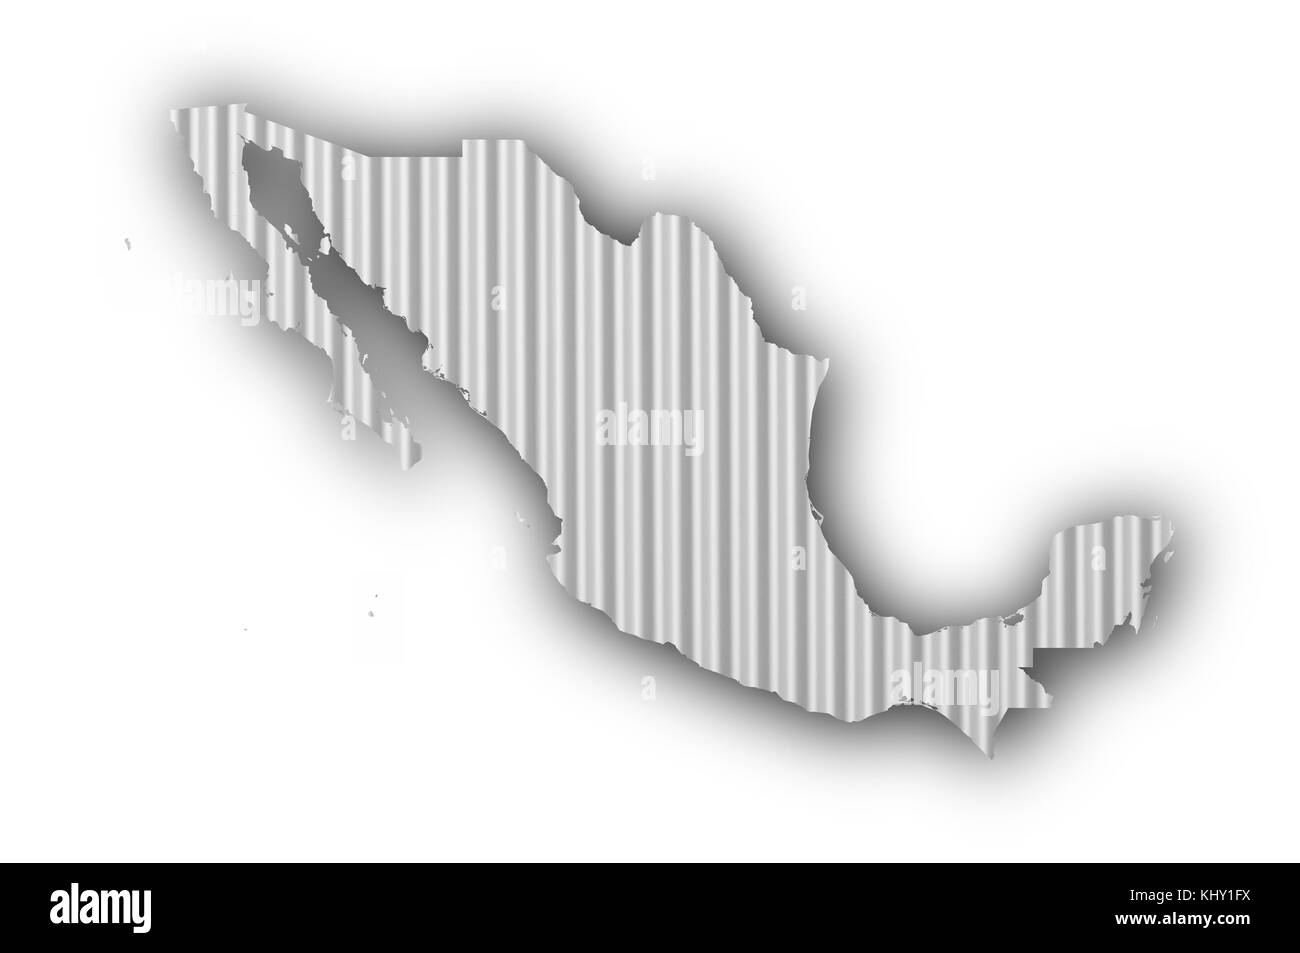 Map of Mexico on corrugated iron - Stock Image